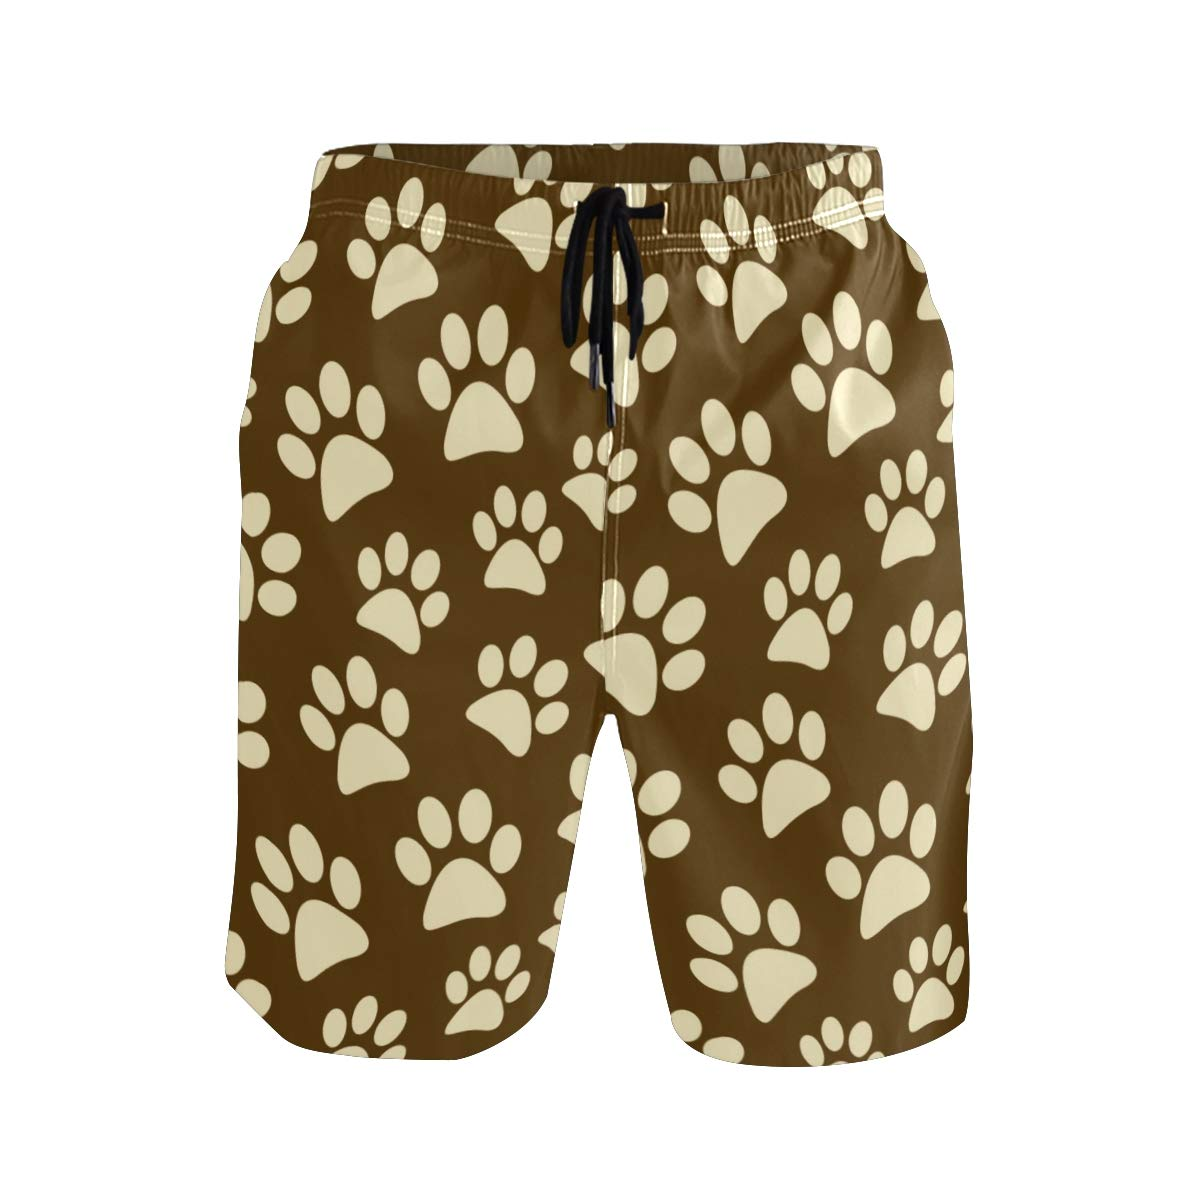 KUWT Mens Swim Trunks Animal Dog Cat Paw Print Quick Dry Beach Shorts Summer Surf Board Shorts